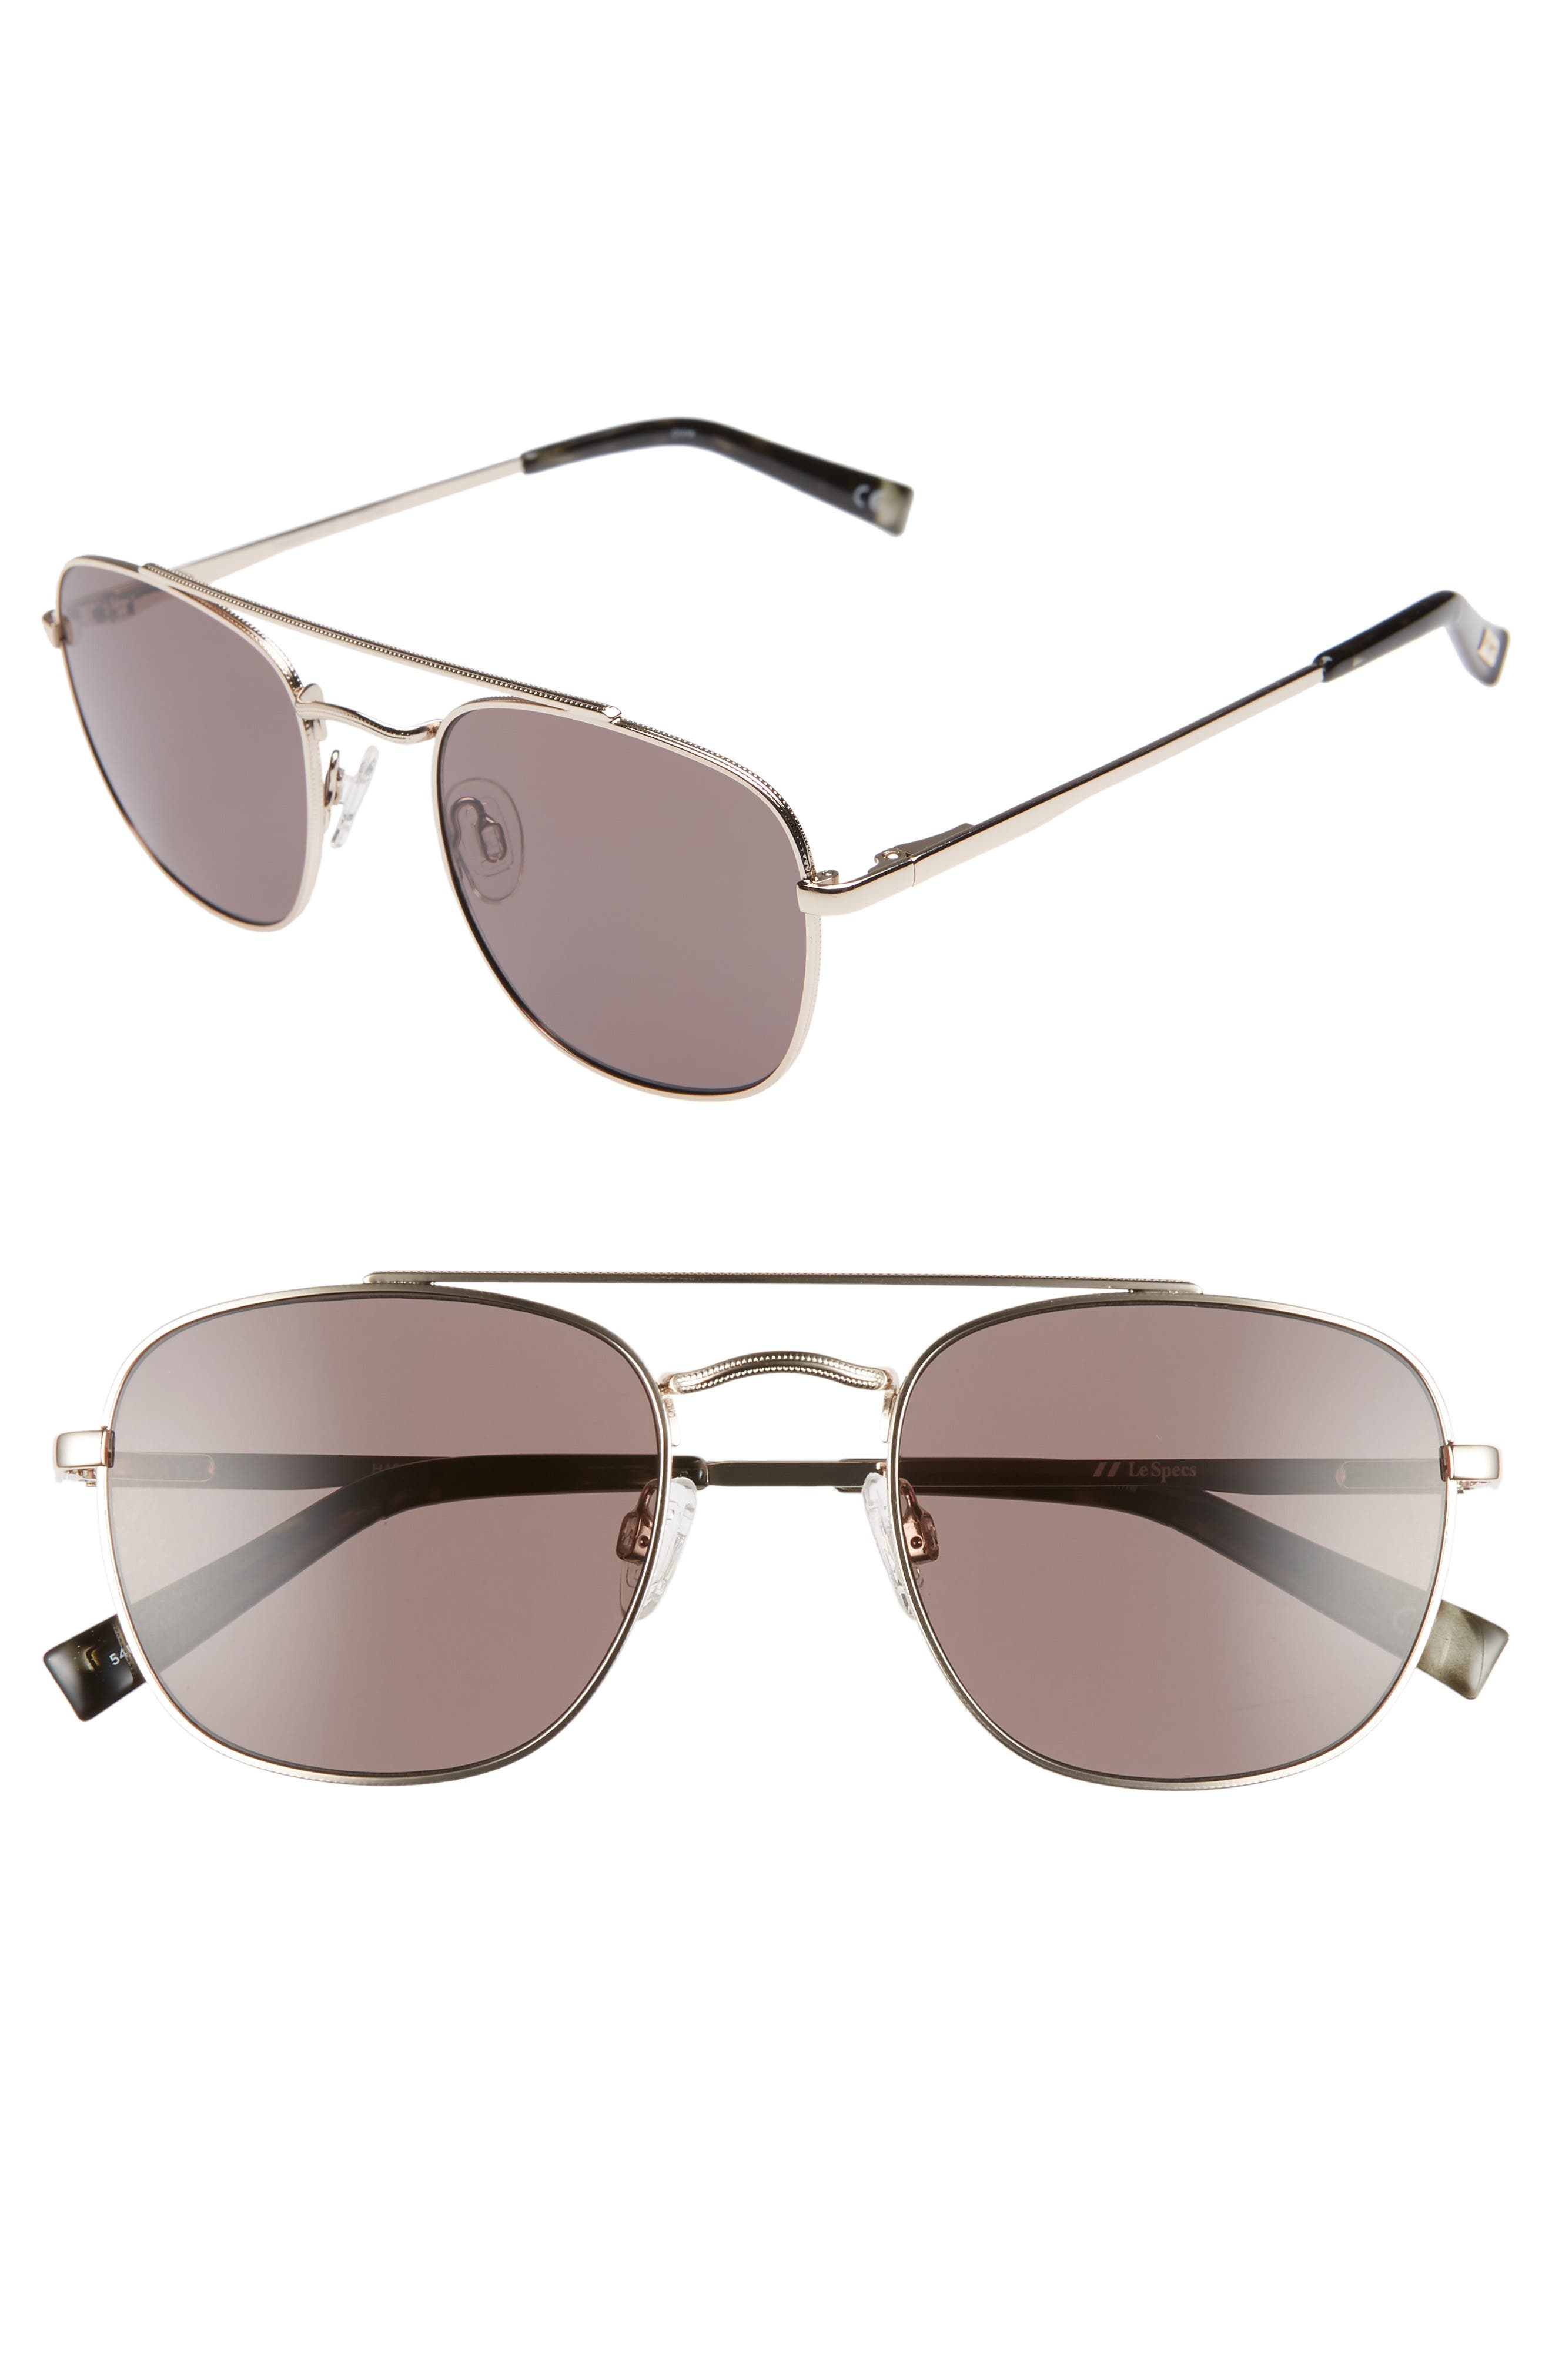 Le Specs 5m Aviator Sunglasses - Gold